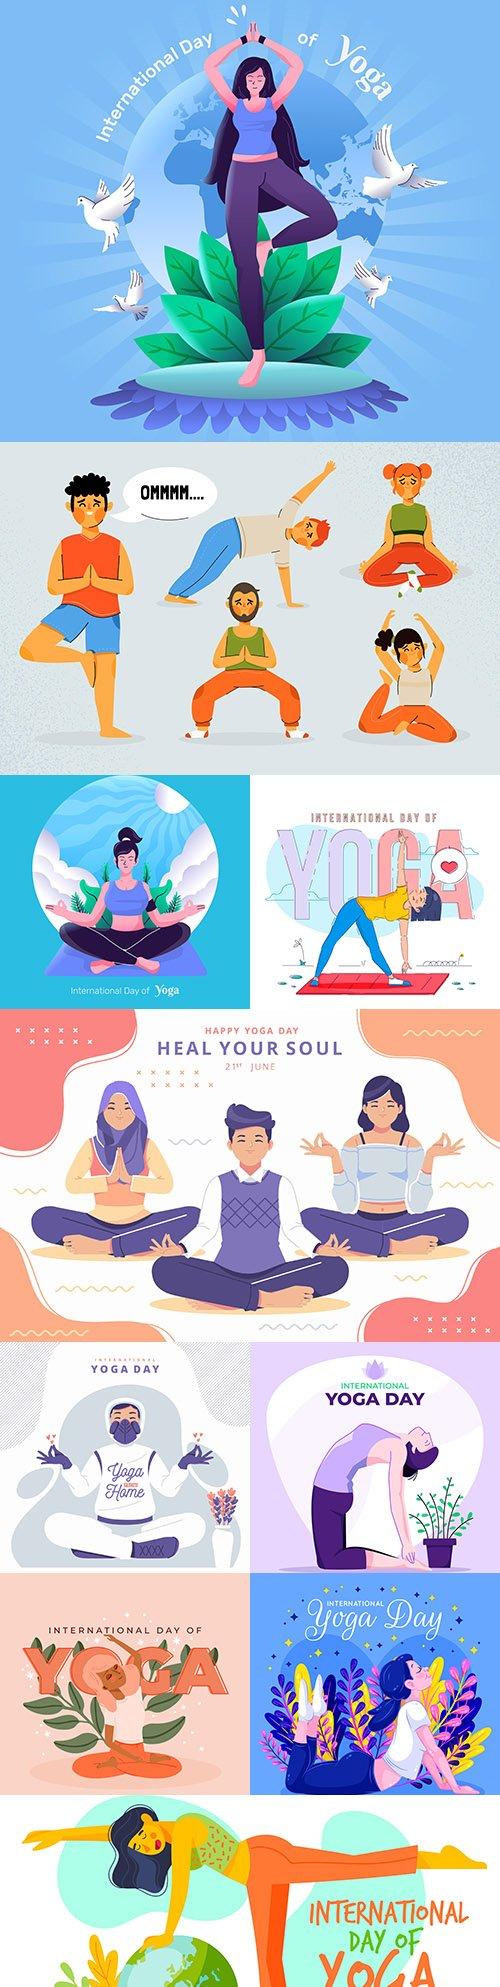 Yoga International day and meditation design illustration 4